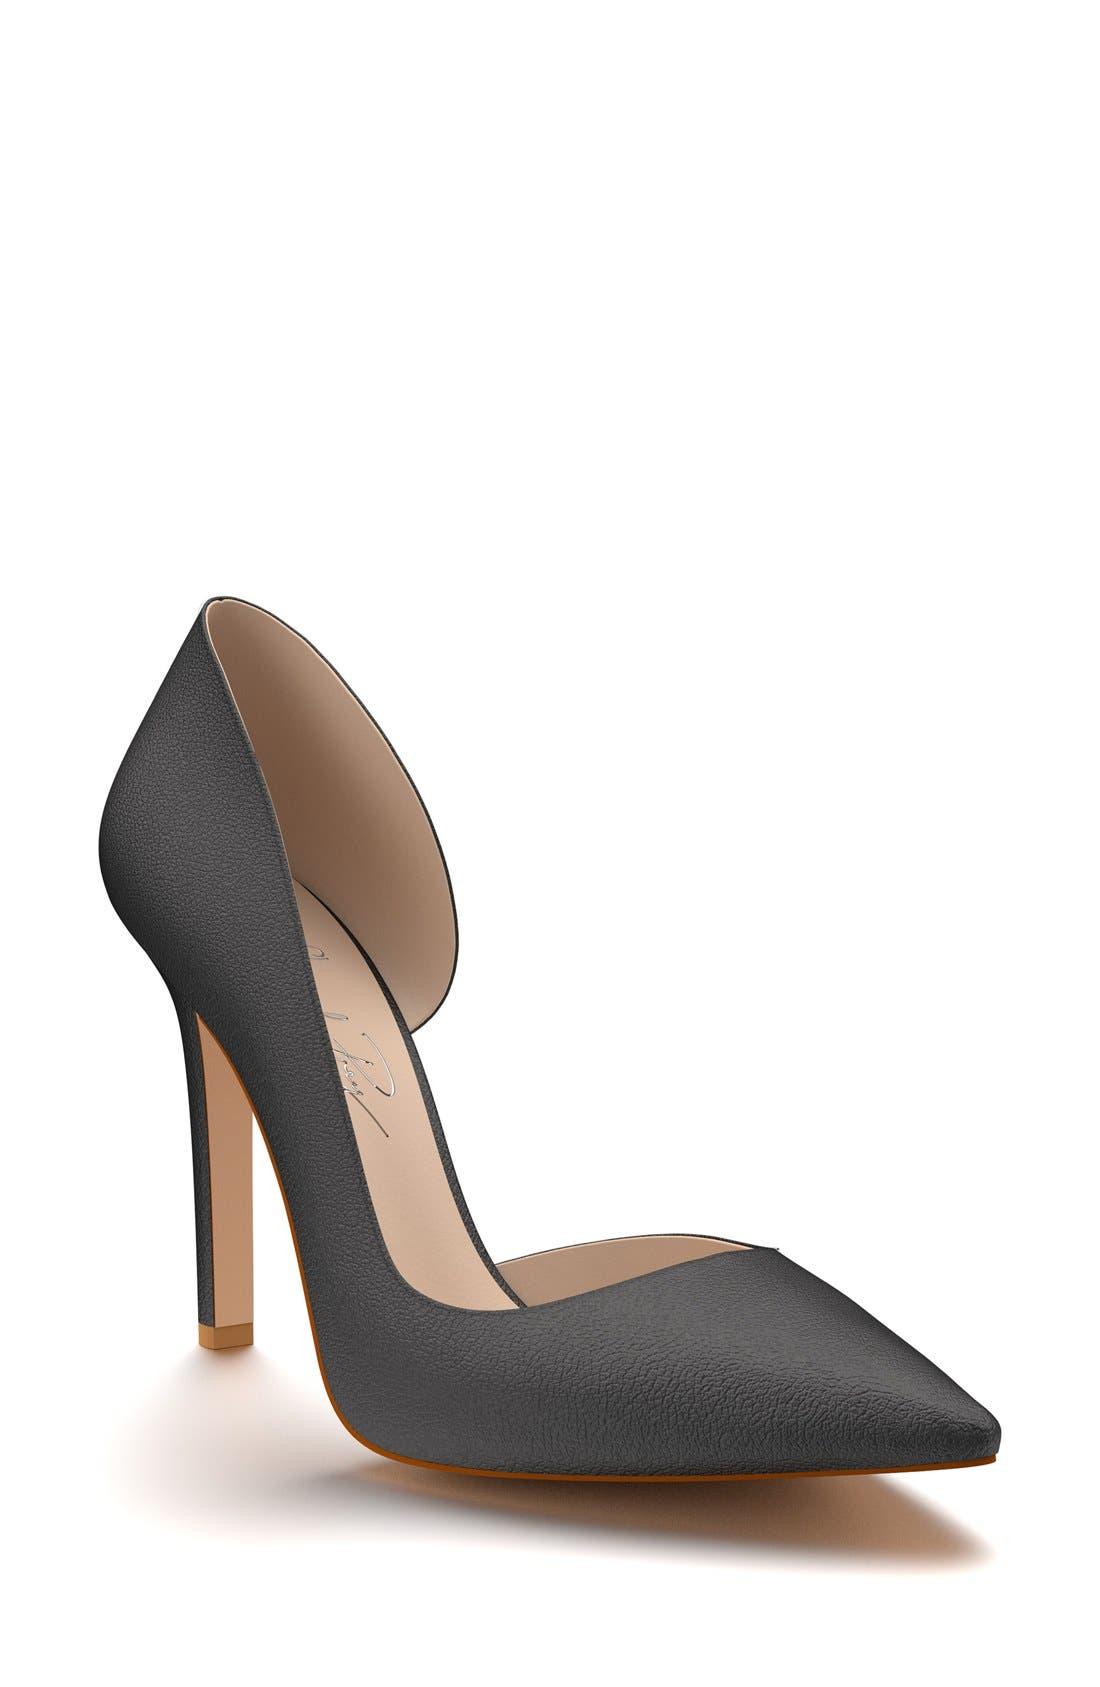 Alternate Image 1 Selected - Shoes of Prey Half d'Orsay Pump (Women)